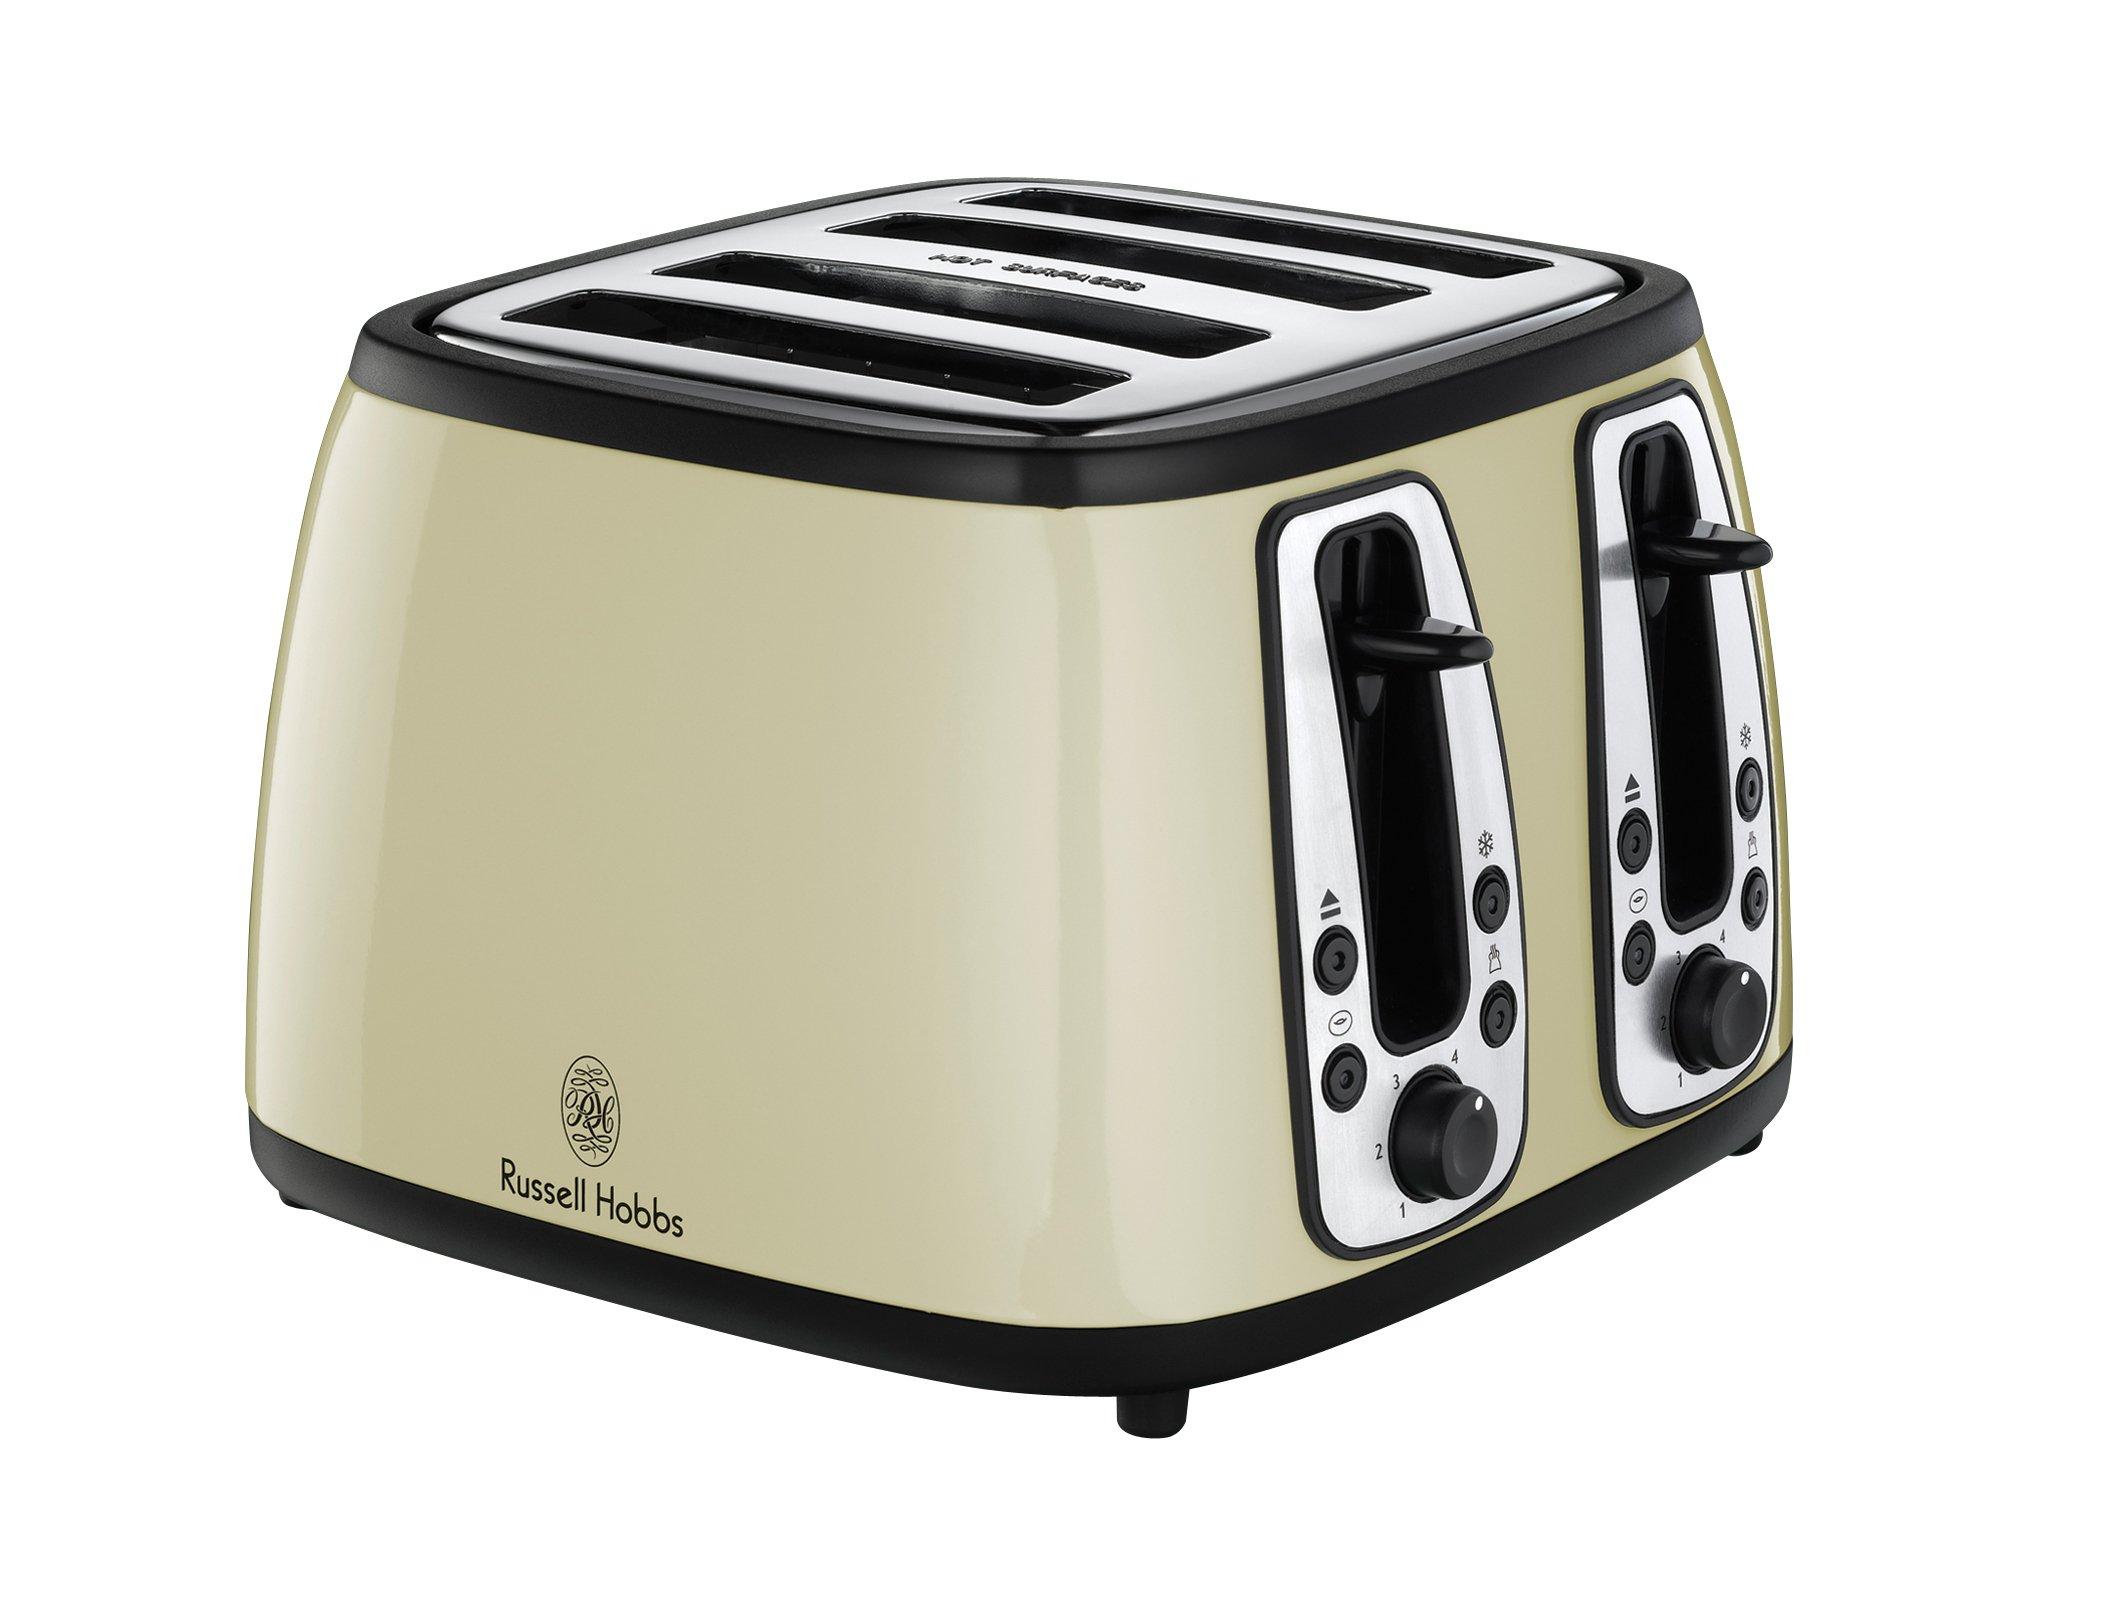 russell hobbs 18369 heritage 4 slice toaster cream cream ebay. Black Bedroom Furniture Sets. Home Design Ideas